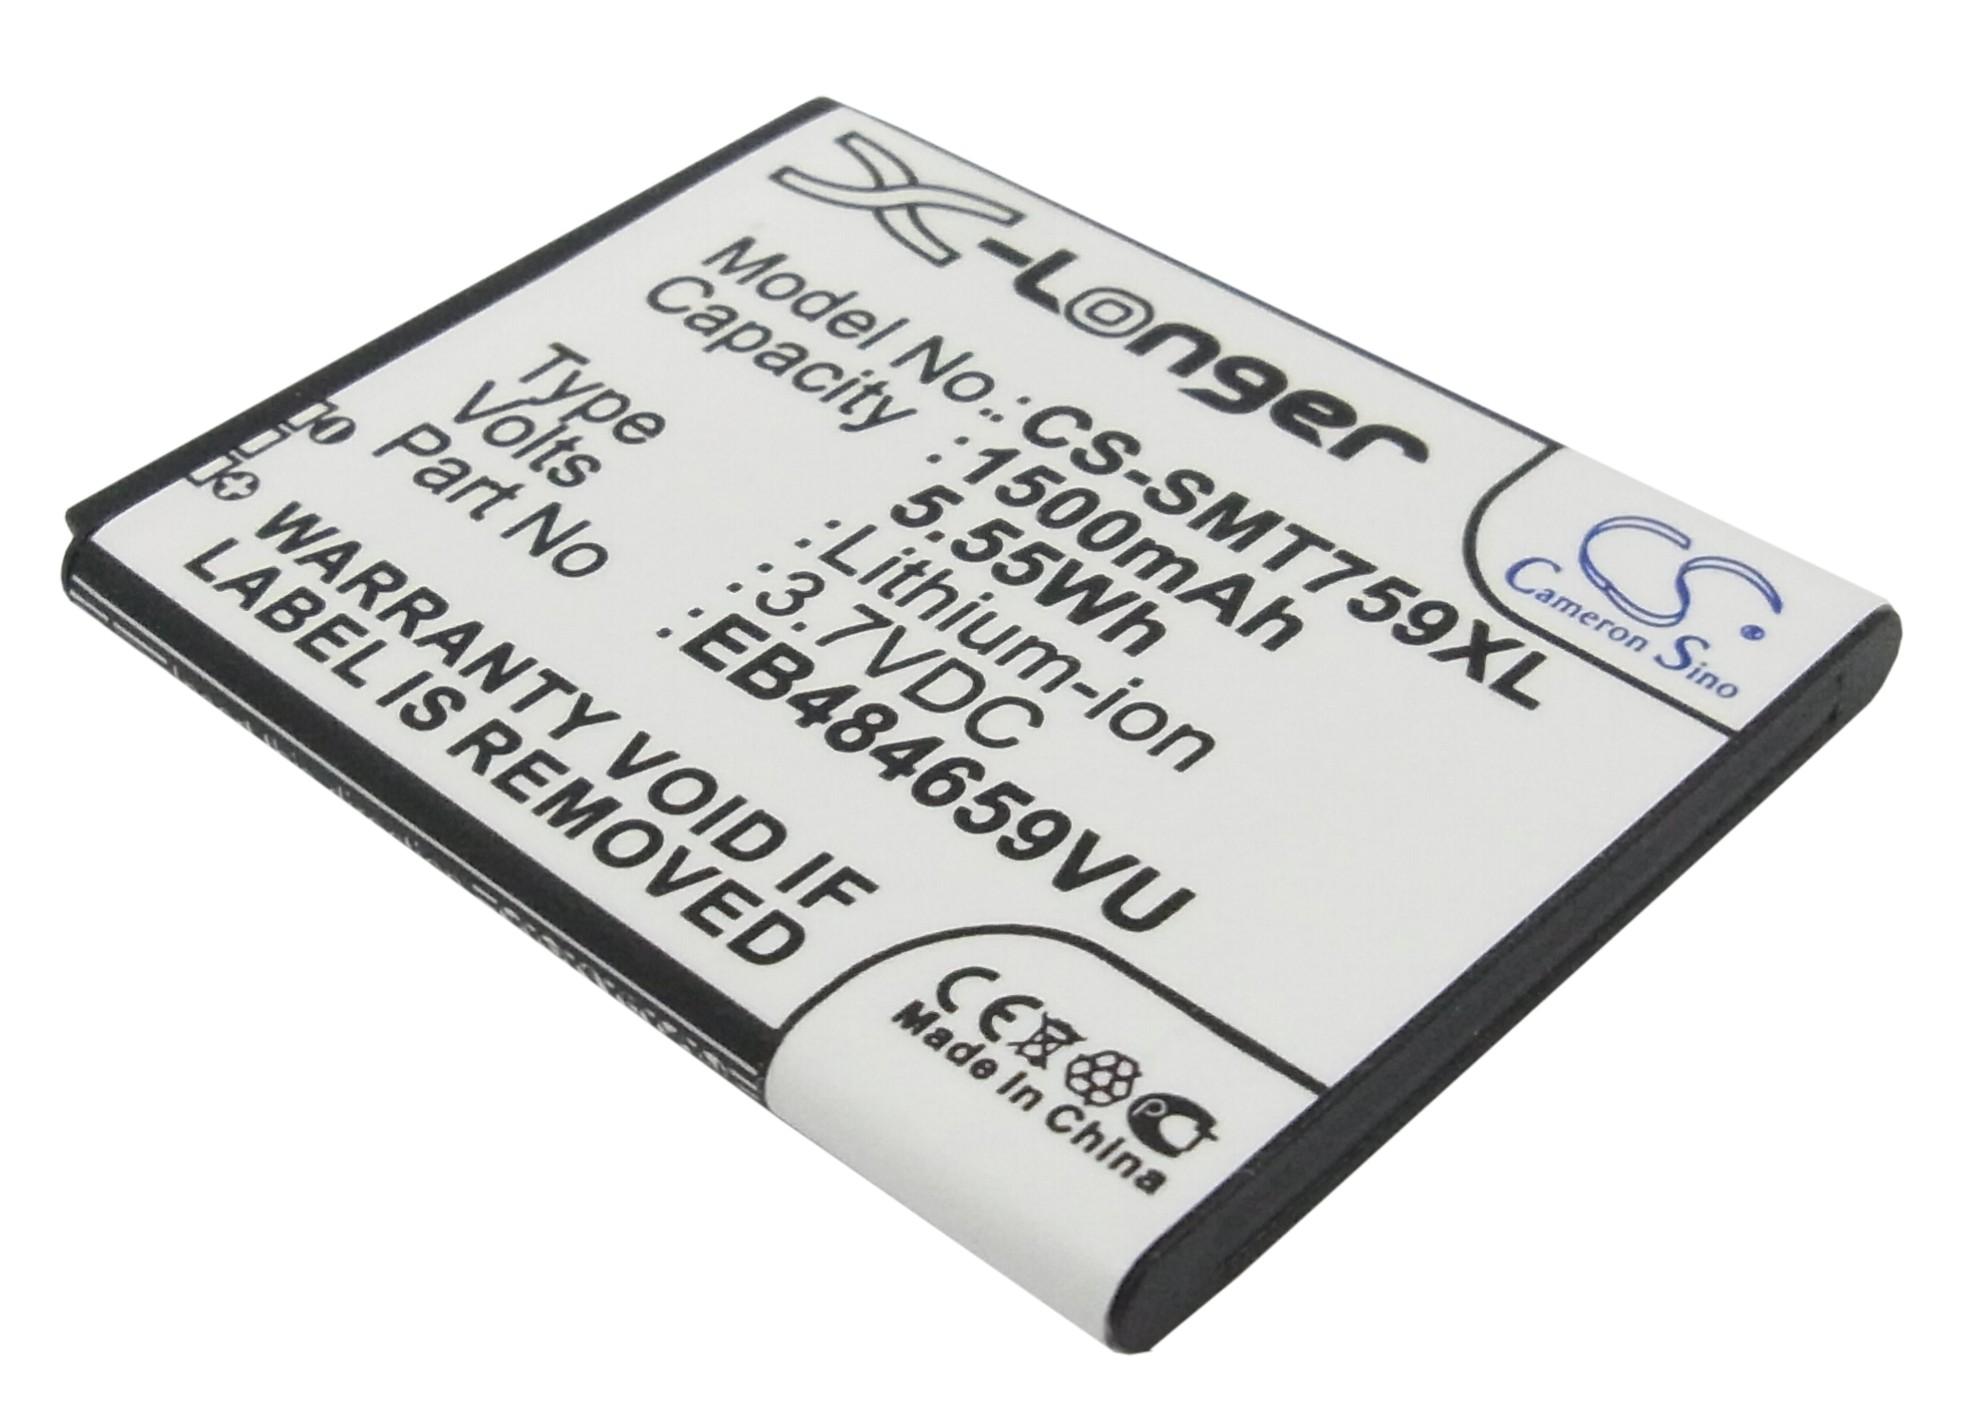 Cameron Sino baterie do mobilů pro SAMSUNG GT-S5690 3.7V Li-ion 1500mAh černá - neoriginální